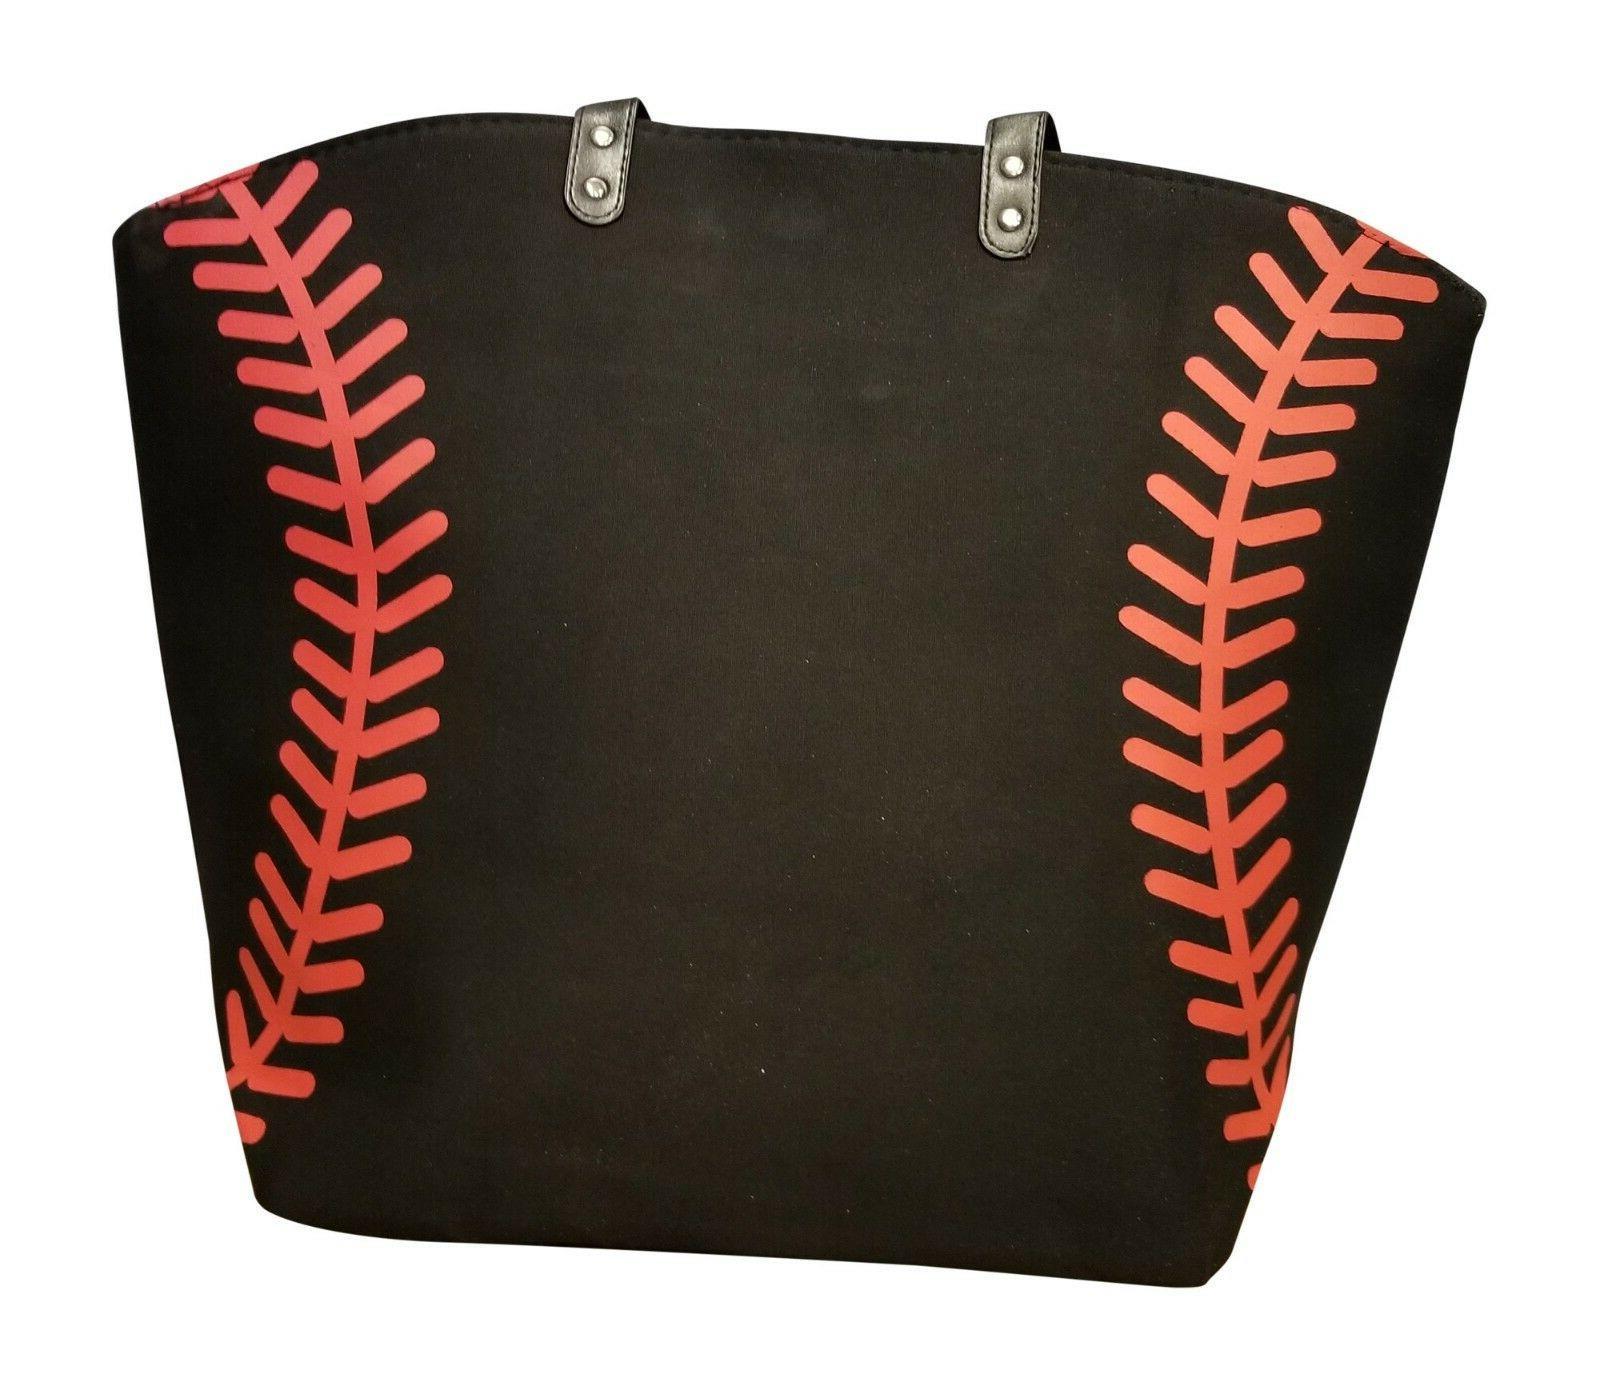 black baseball seam canvas tote bag purse